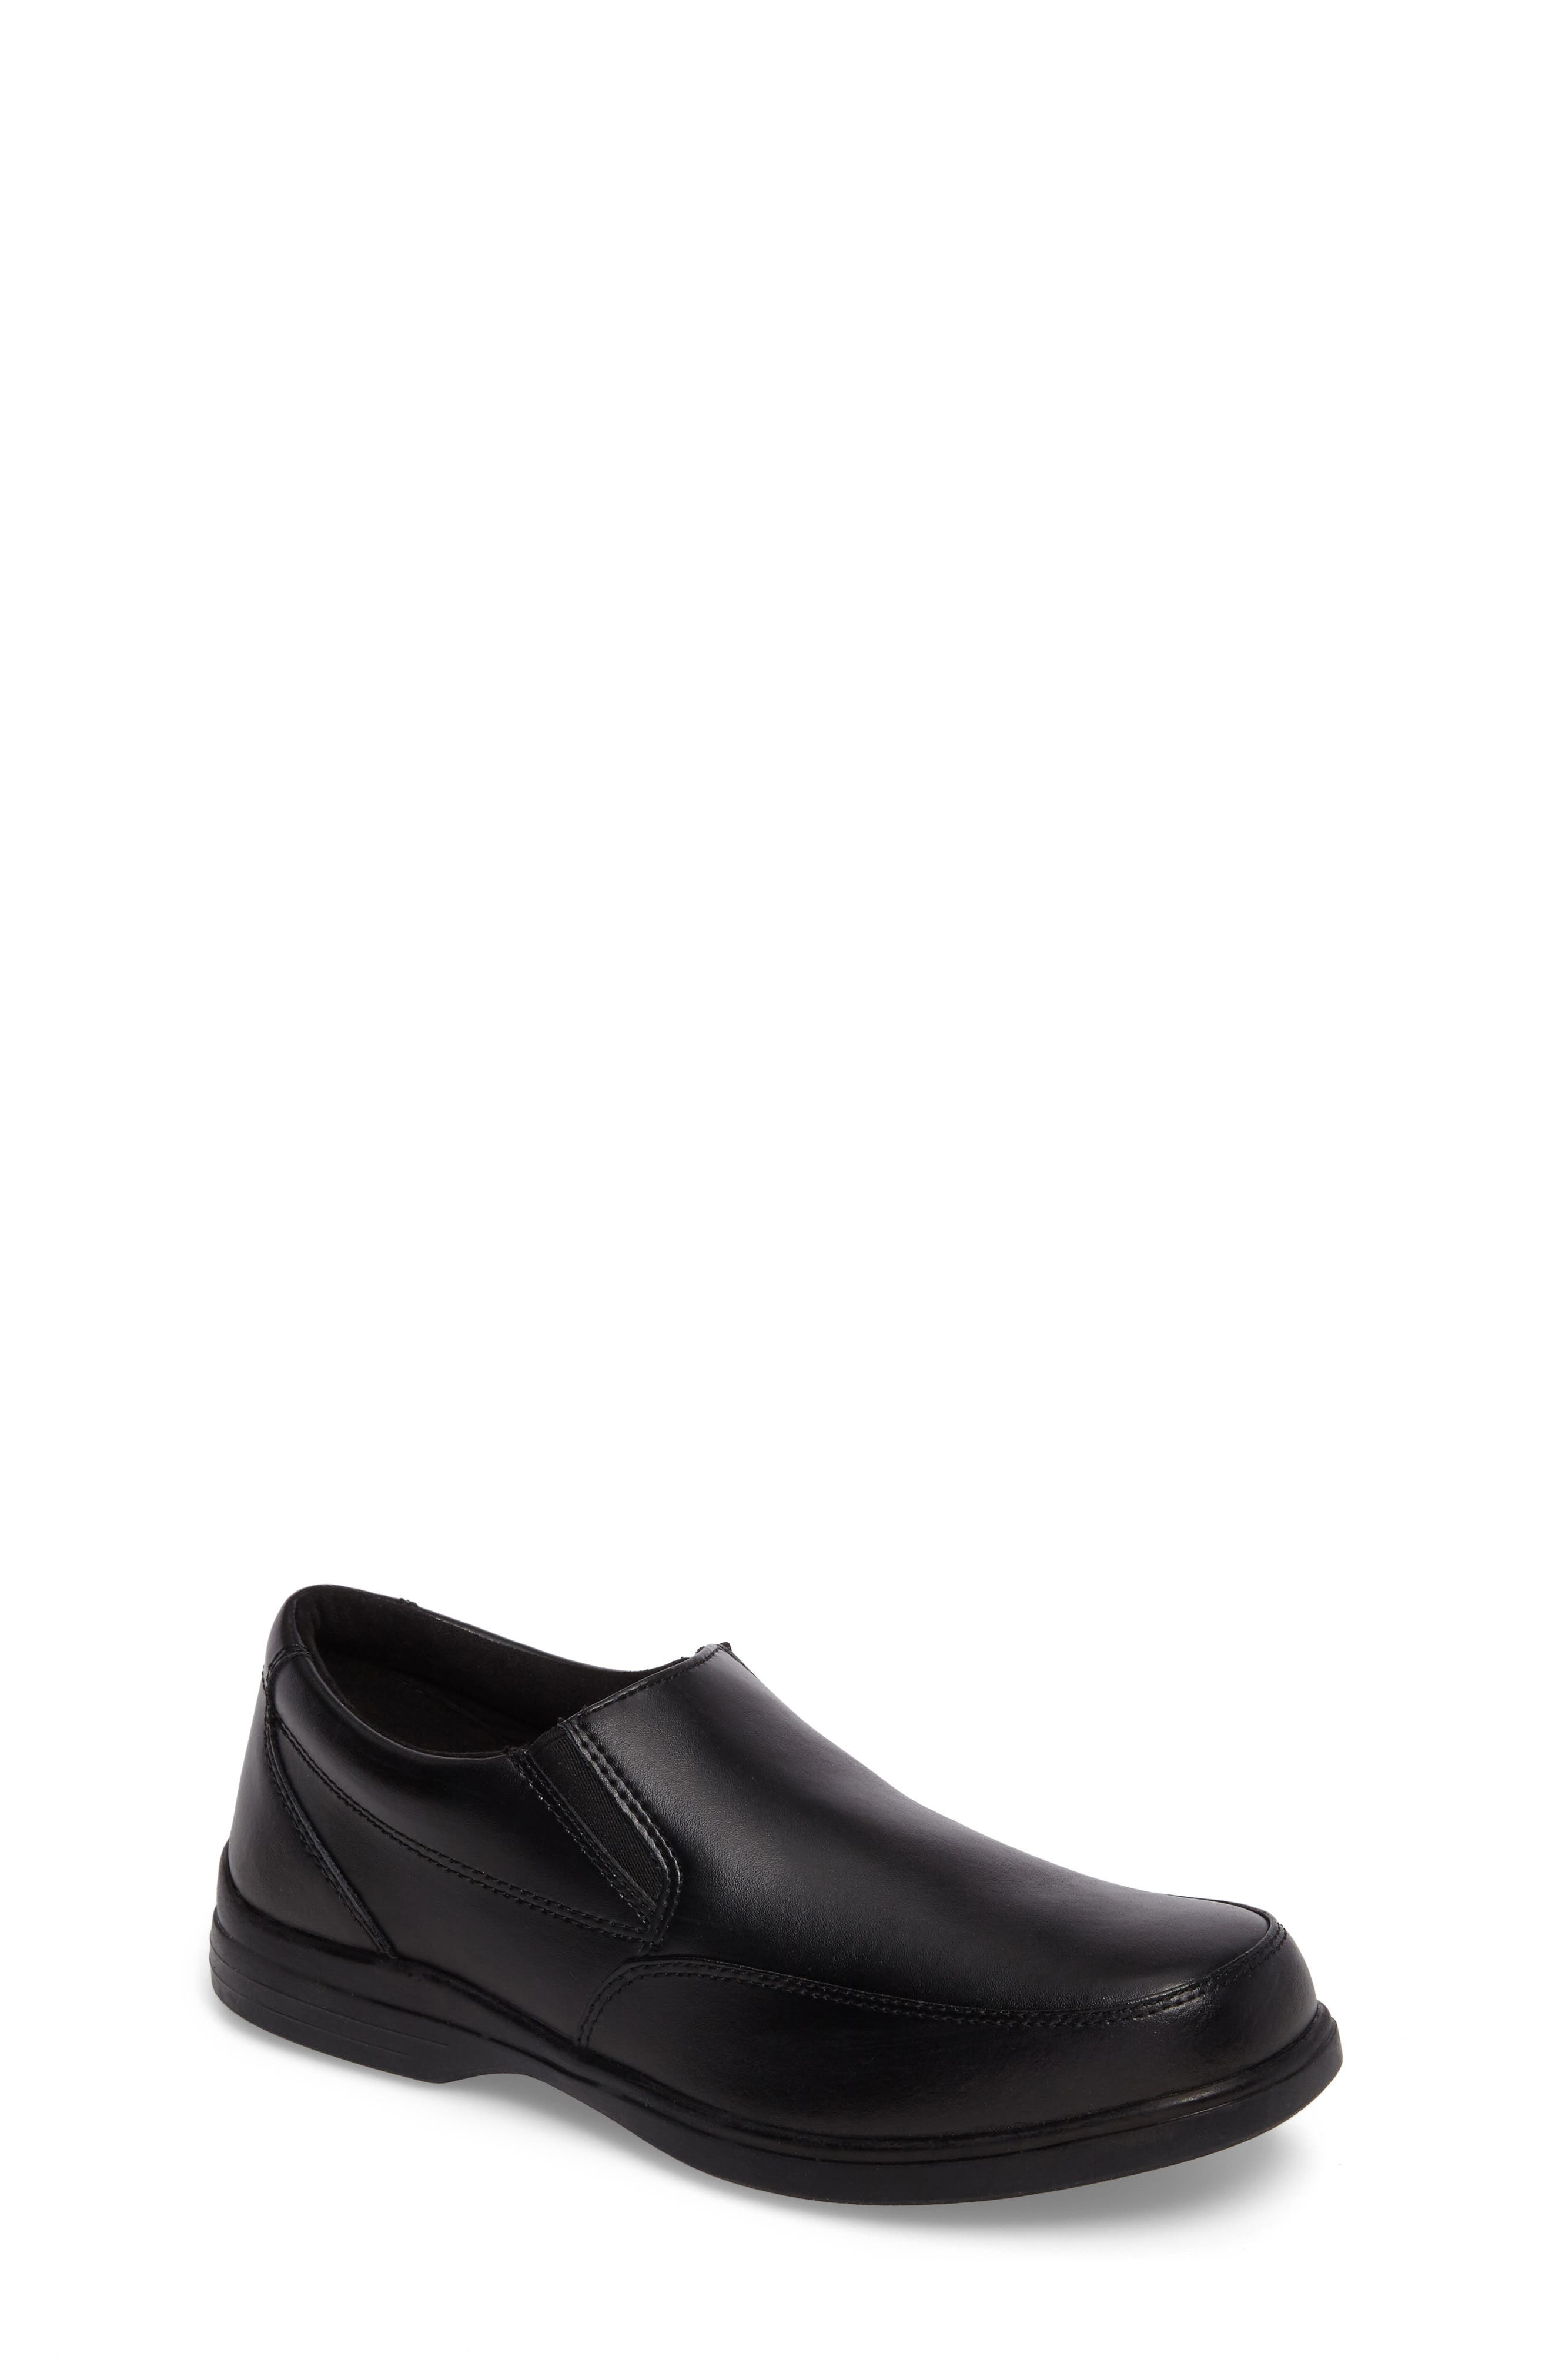 Shane Slip-On Dress Shoe,                         Main,                         color, Black Leather